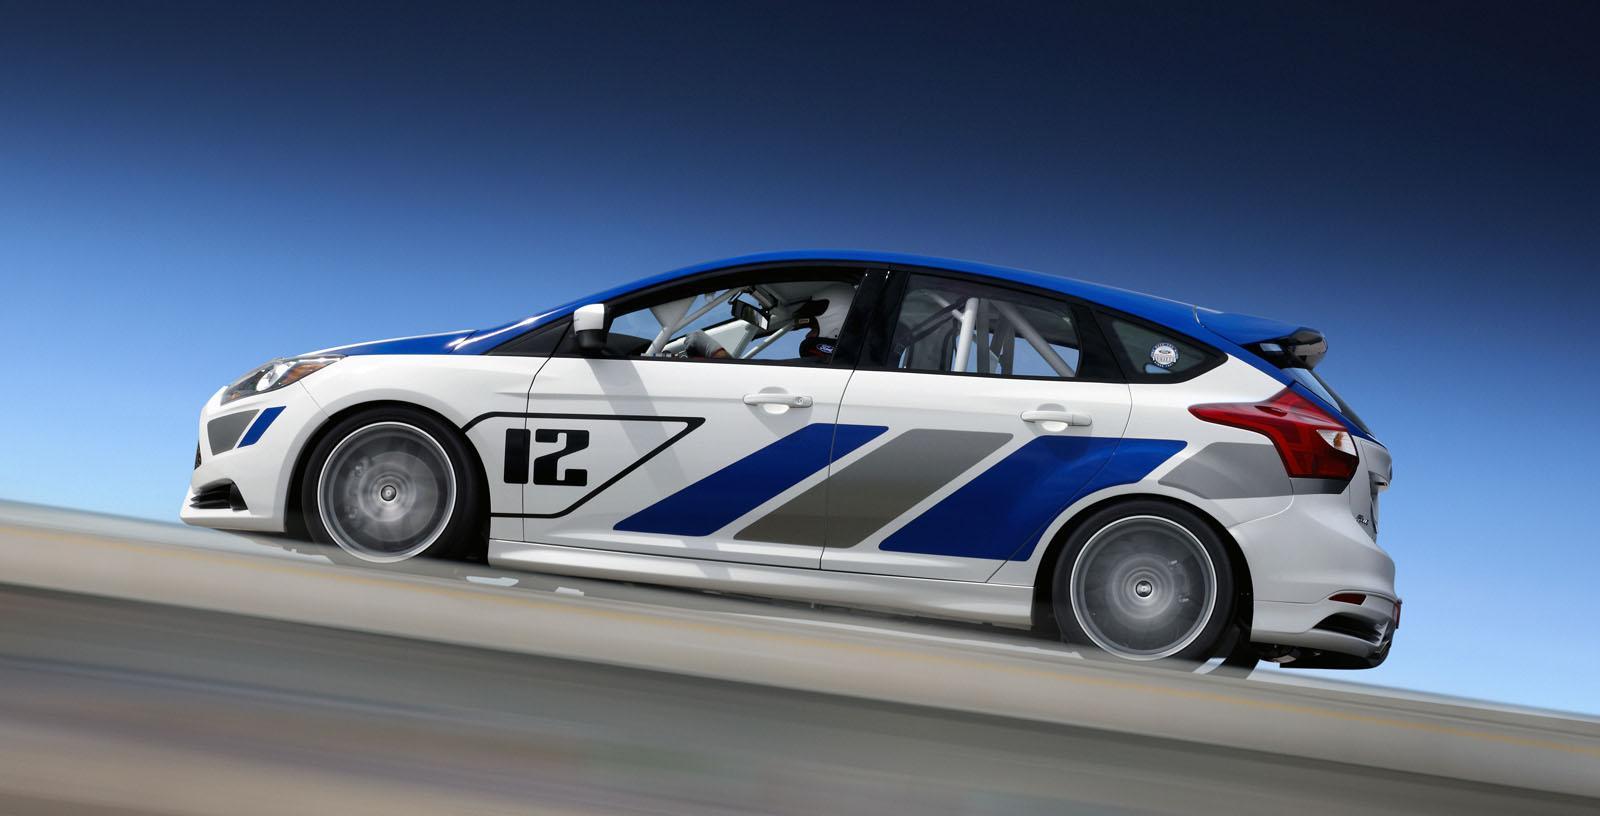 2012 Ford Focus ST-R Race Car Price